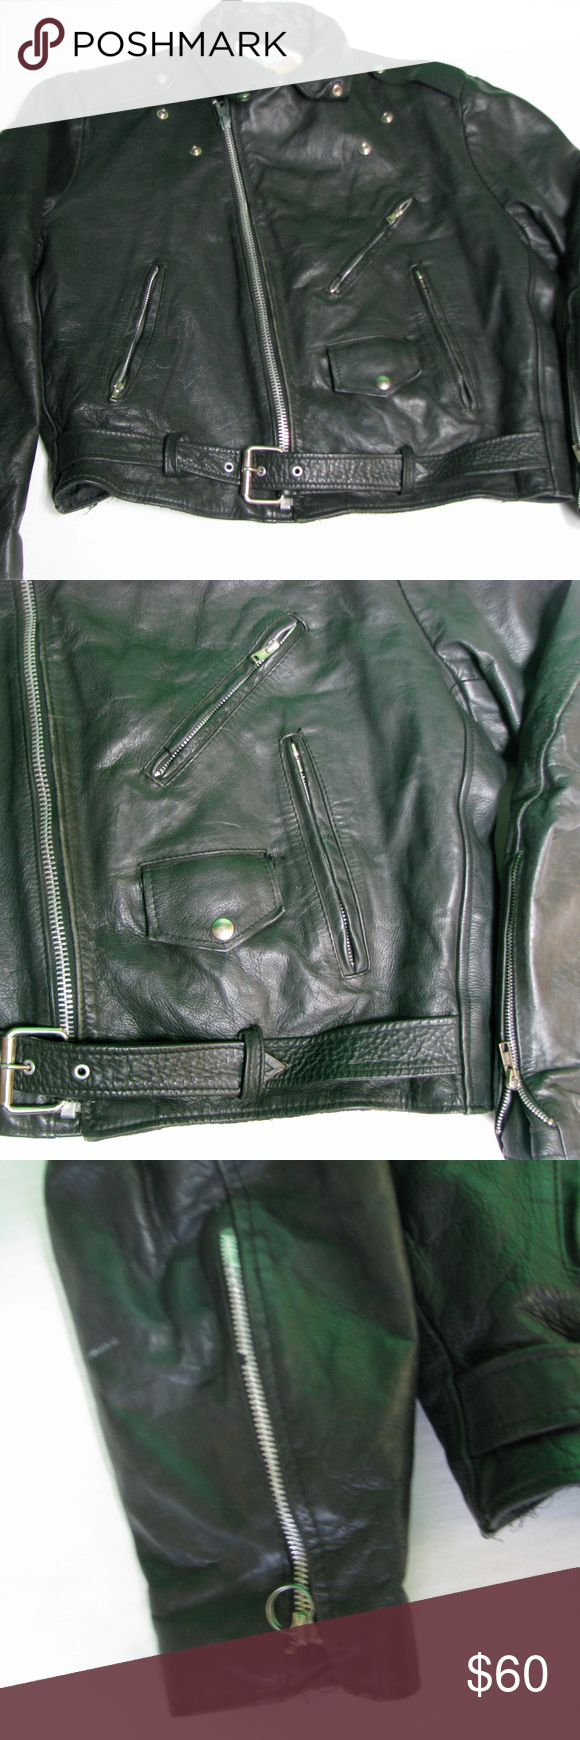 Vintage Leather Riding Jacket 50 Leather Riding Jacket Riding Jacket Leather [ 1740 x 580 Pixel ]